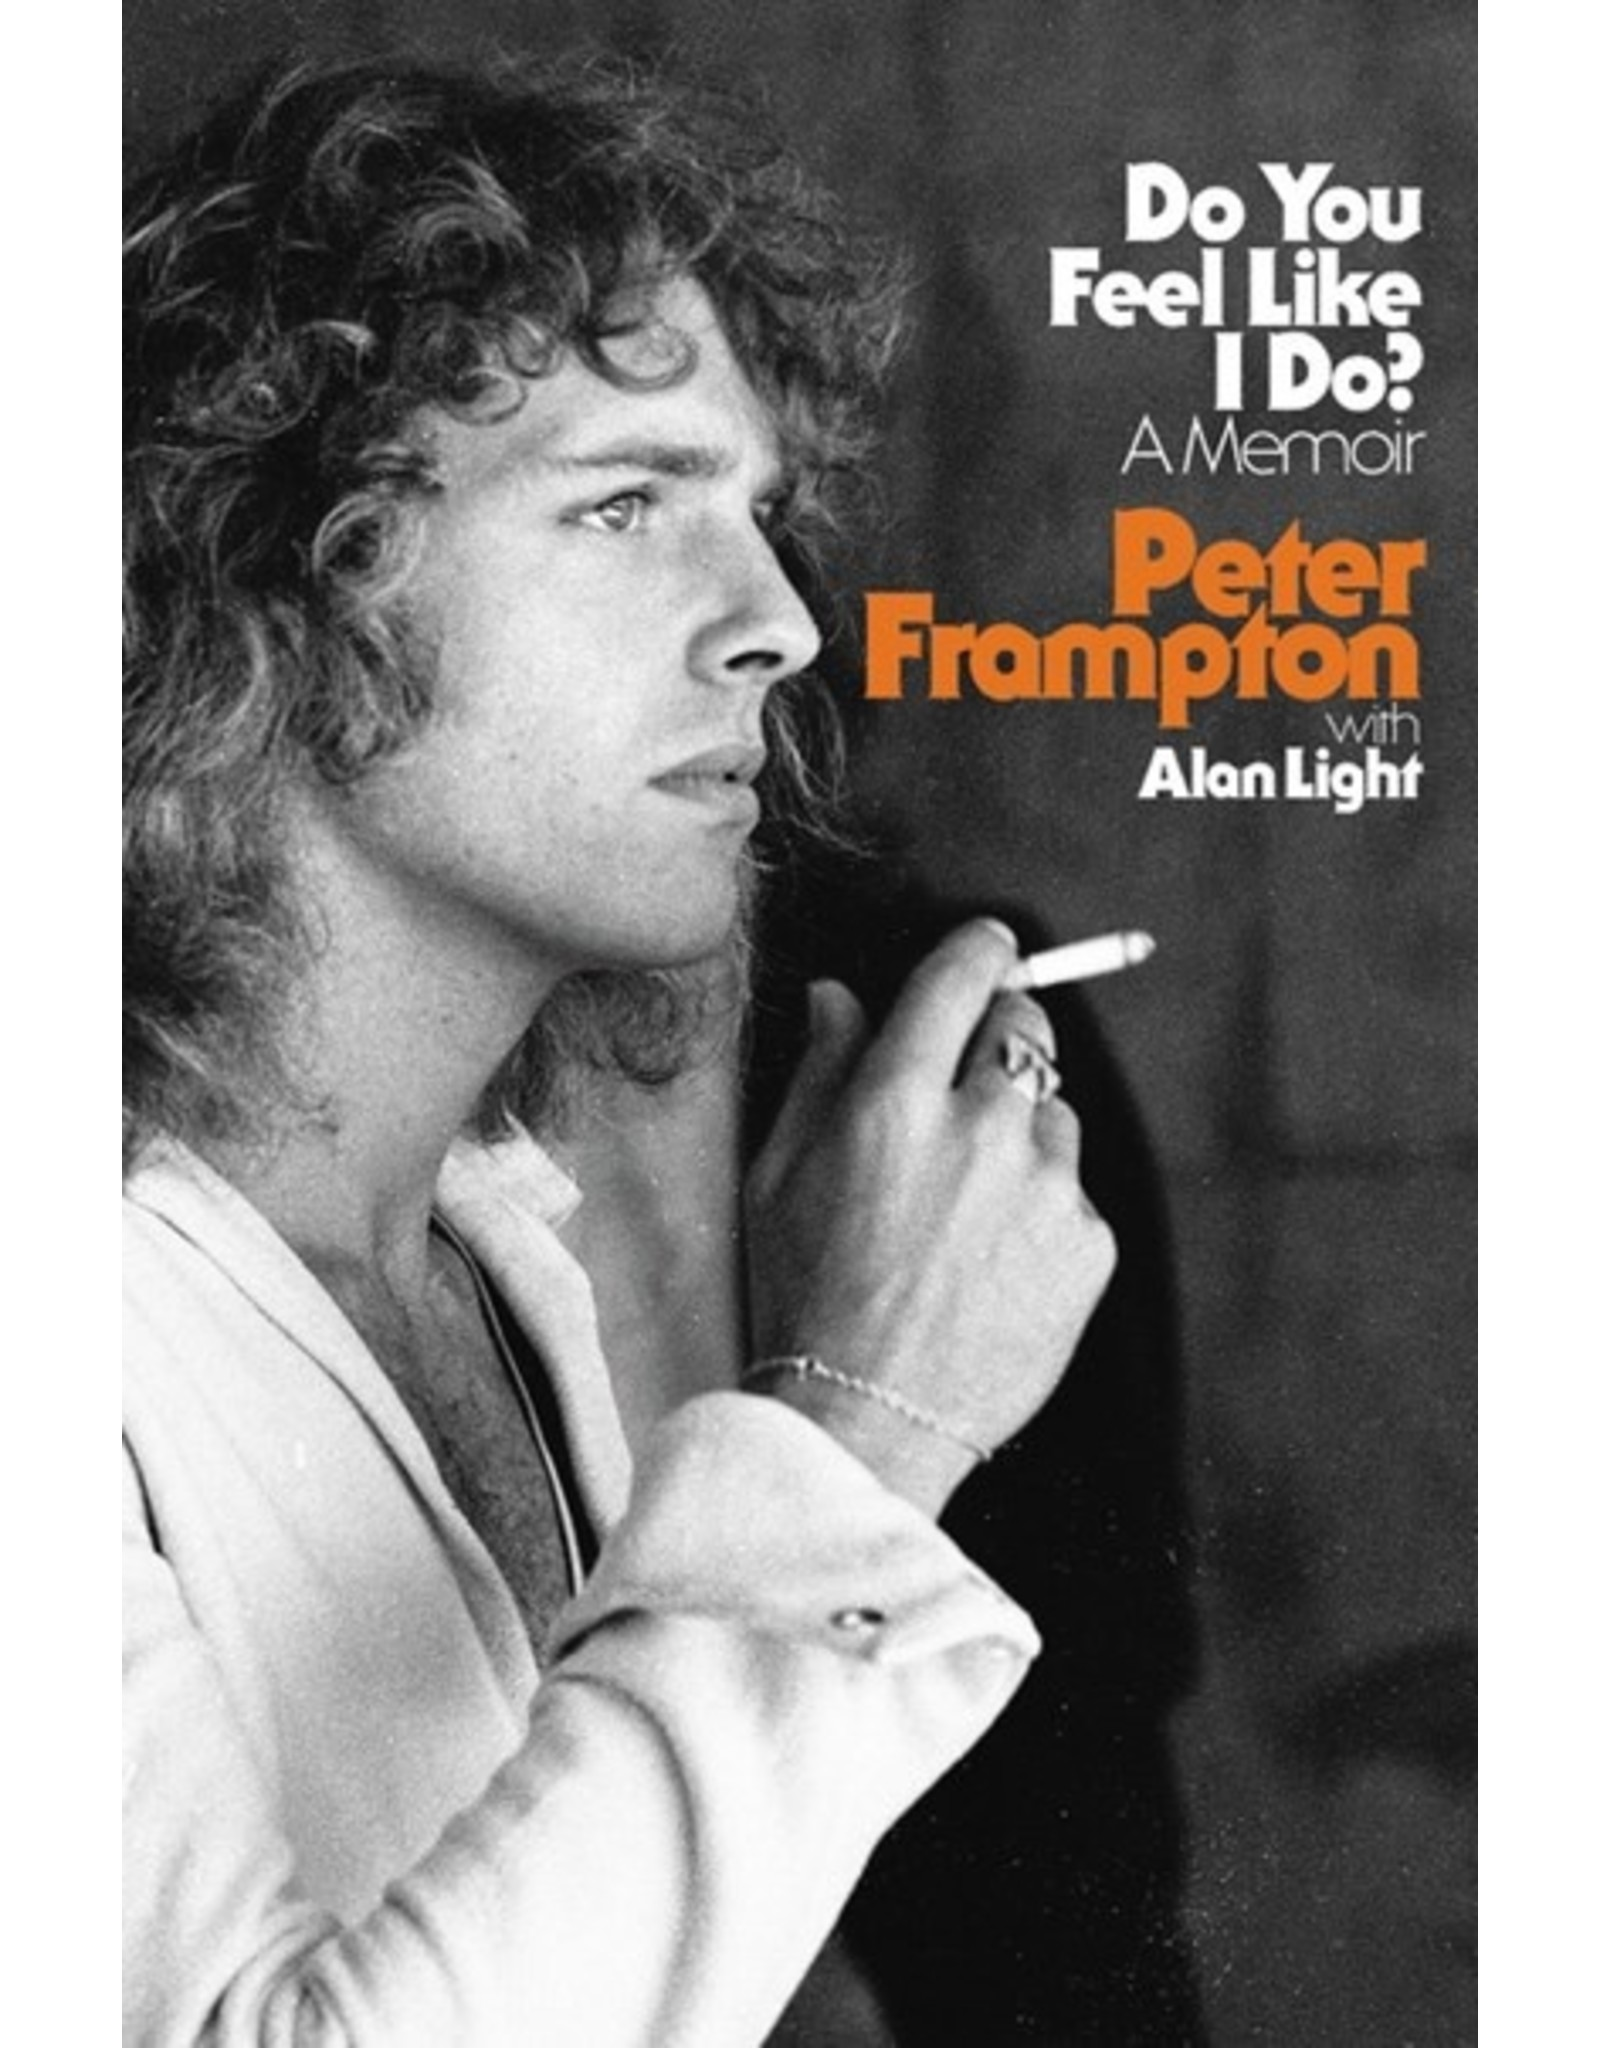 Books Do You Feel Like I Do? : A Memoir  Peter Frampton,  with Alan Light ( Pre-Order)